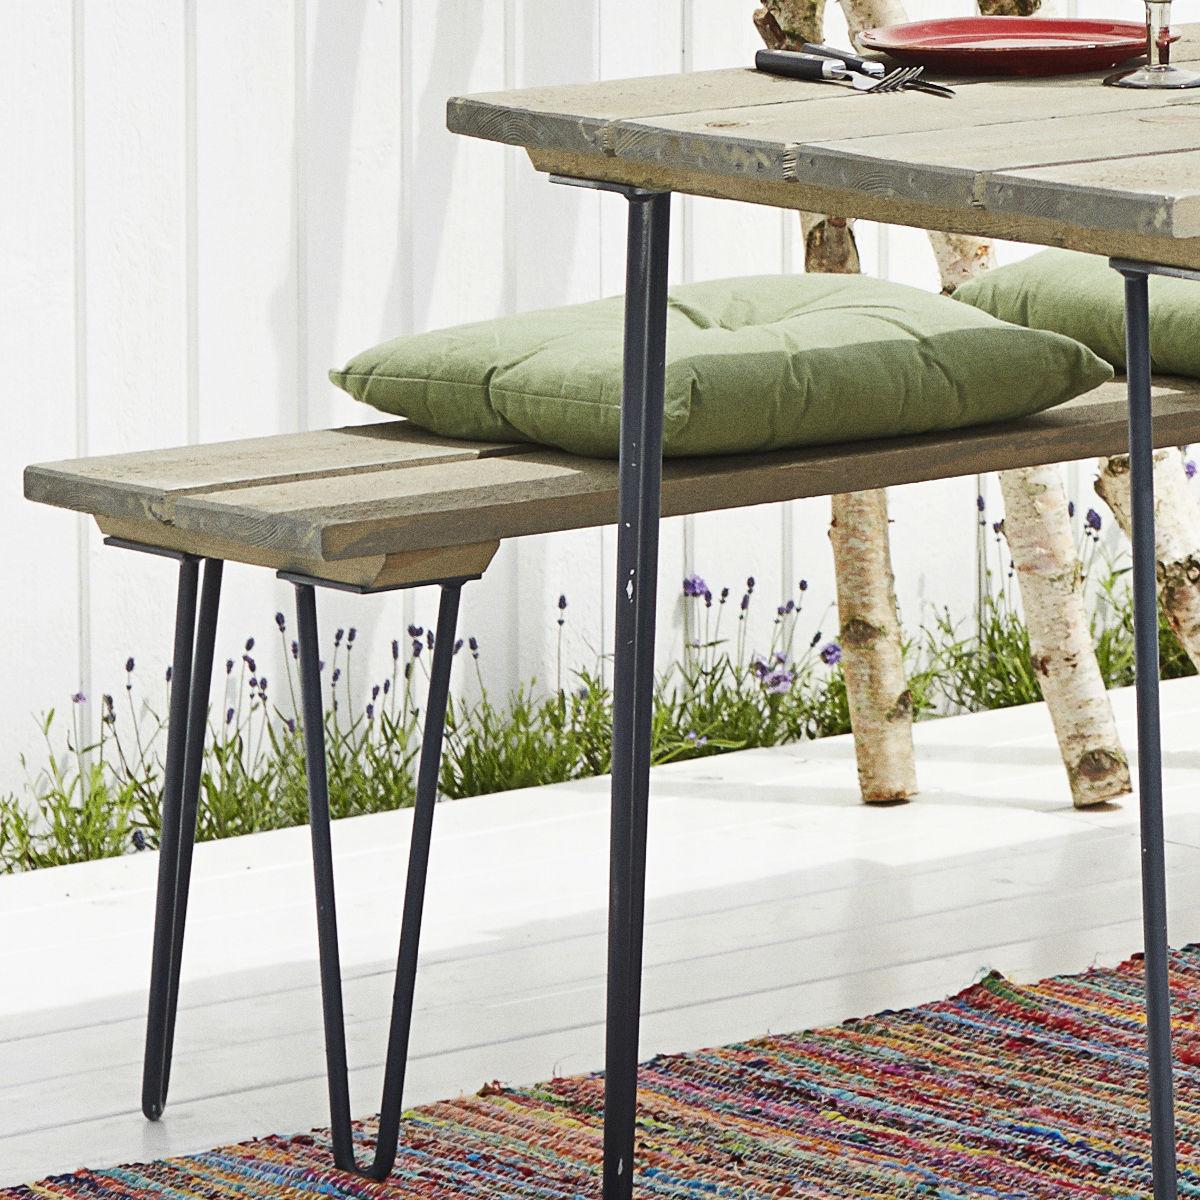 Café & Trädgårdsmöbler | Möbelgrupp Retro